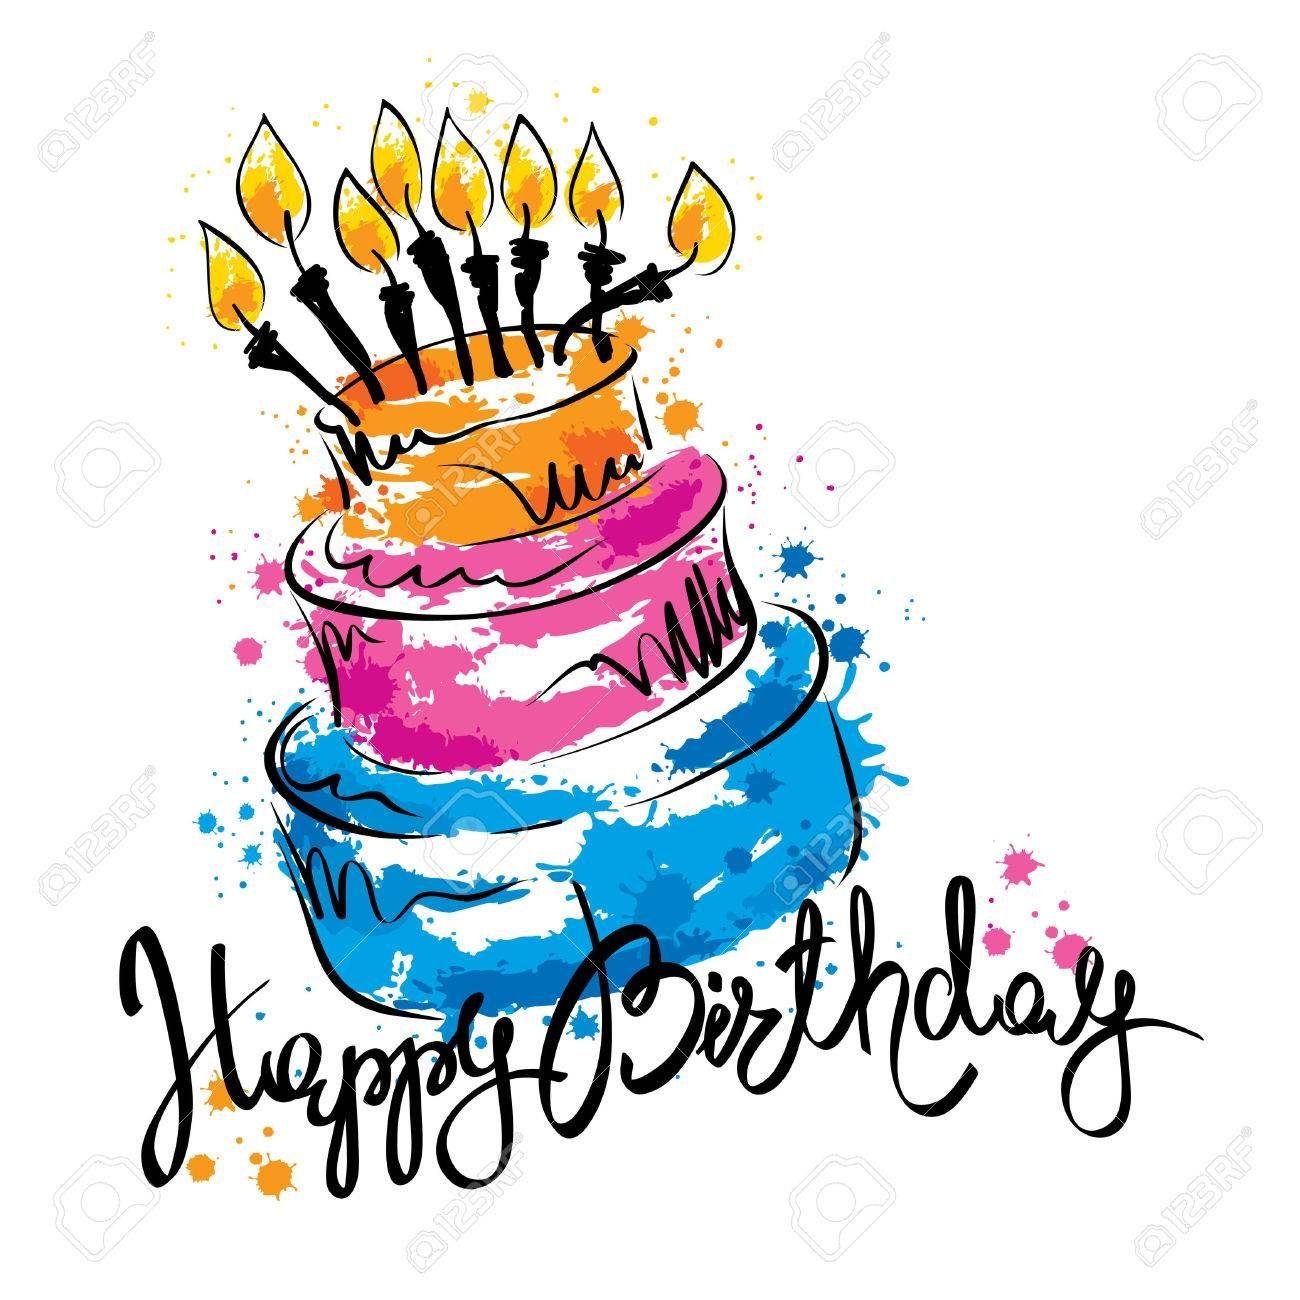 Cake Ans Happy Birthday Handwritten Vector Calligraphy With